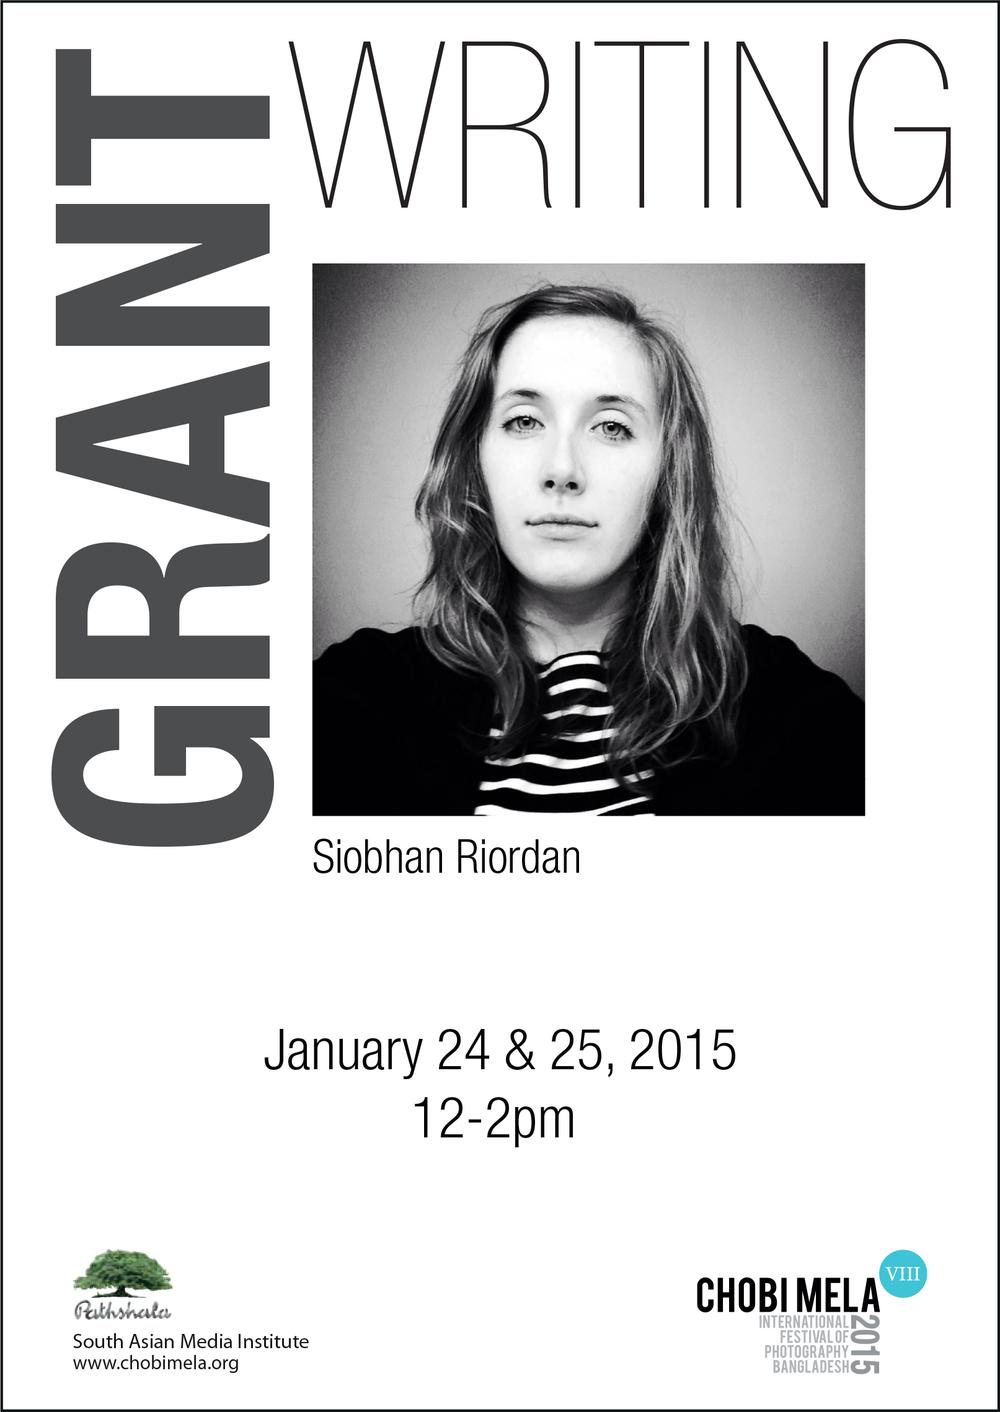 Siobhan Riordan_poster.jpg